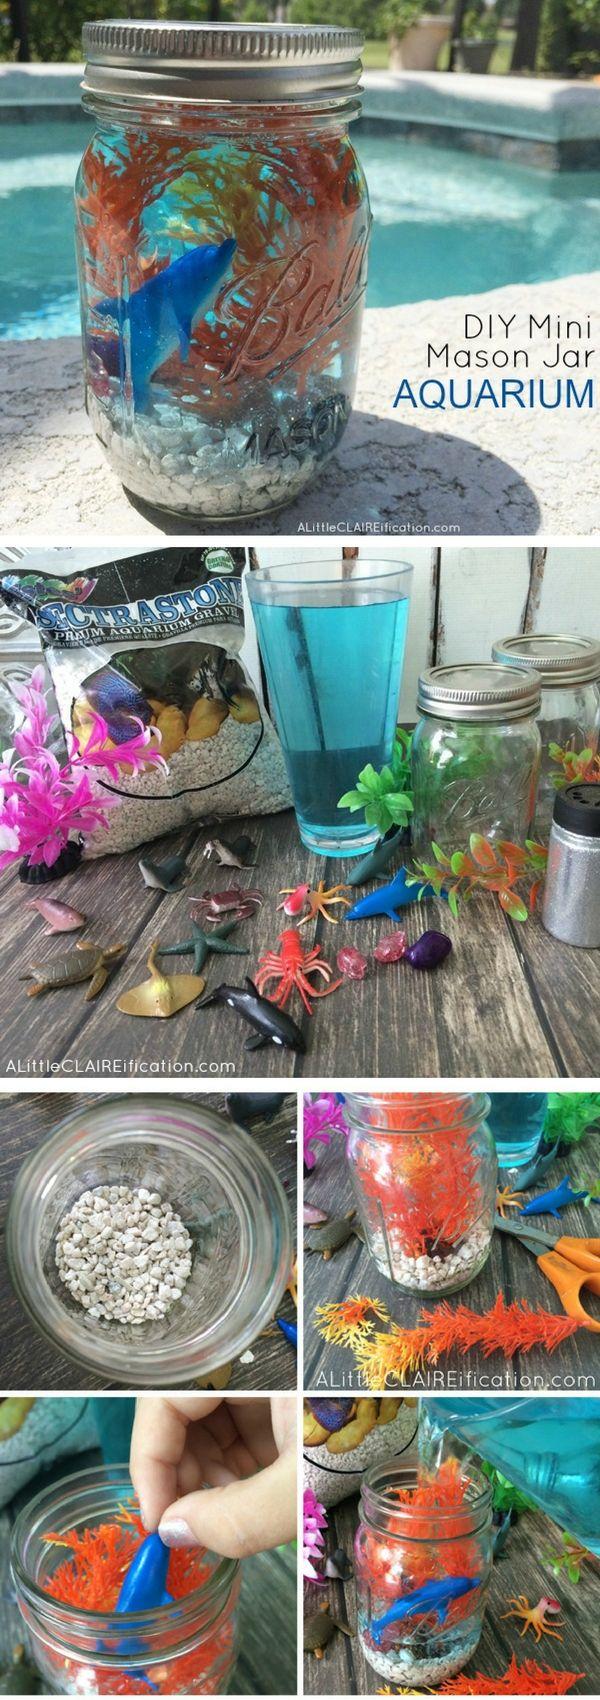 Check out how to make a DIY mason jar mini aquarium @istandarddesign